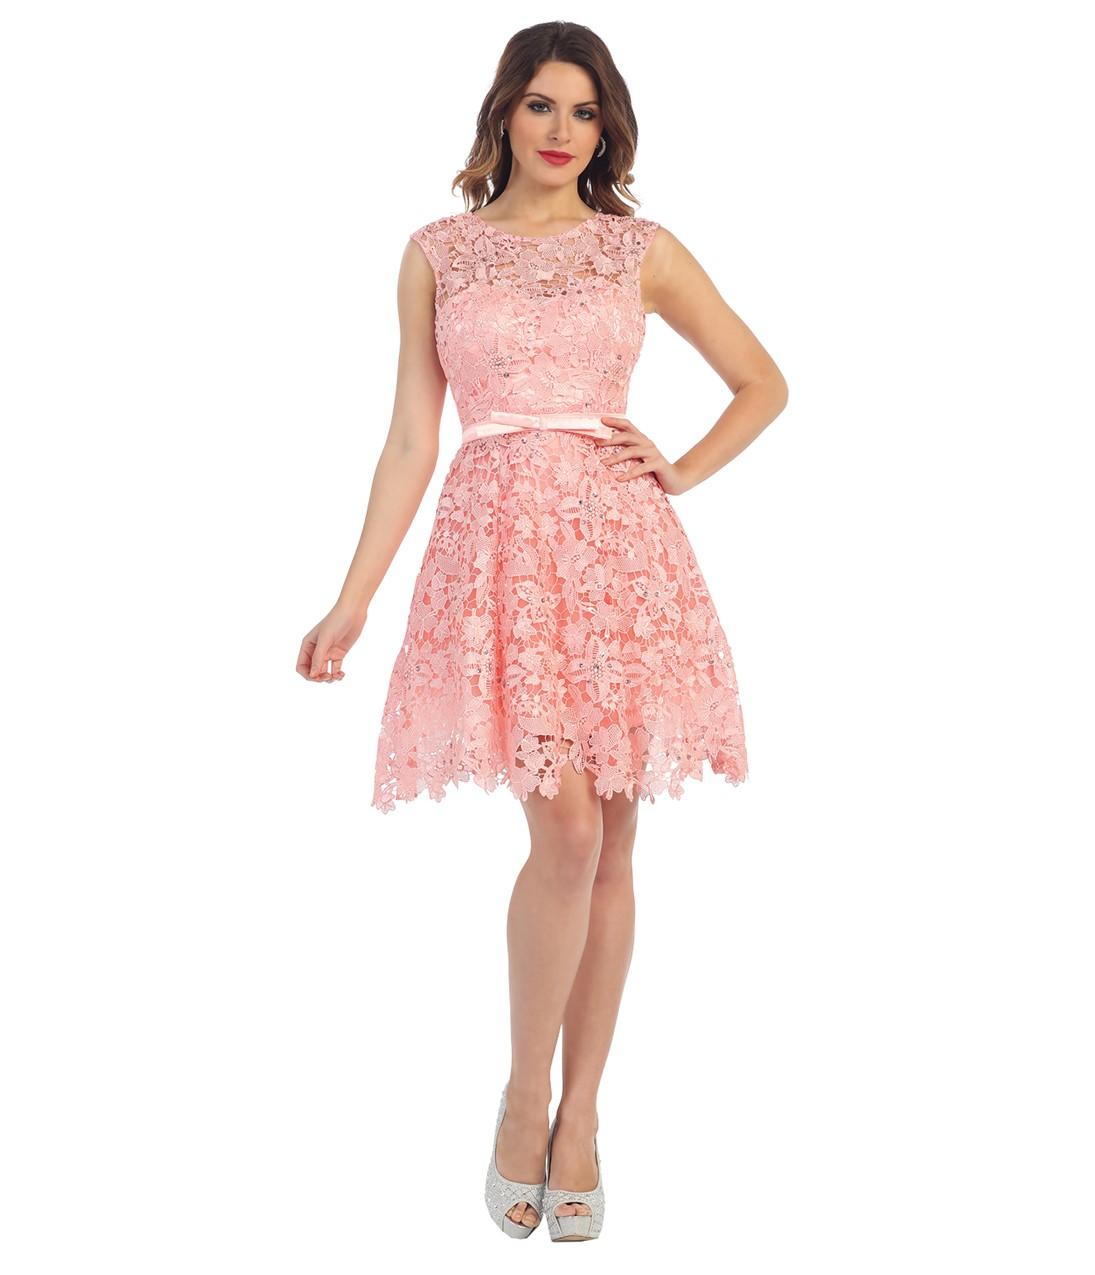 Vestidos cortos de fiesta ¡23 Asombrosos diseños! | Vestidos | Moda ...